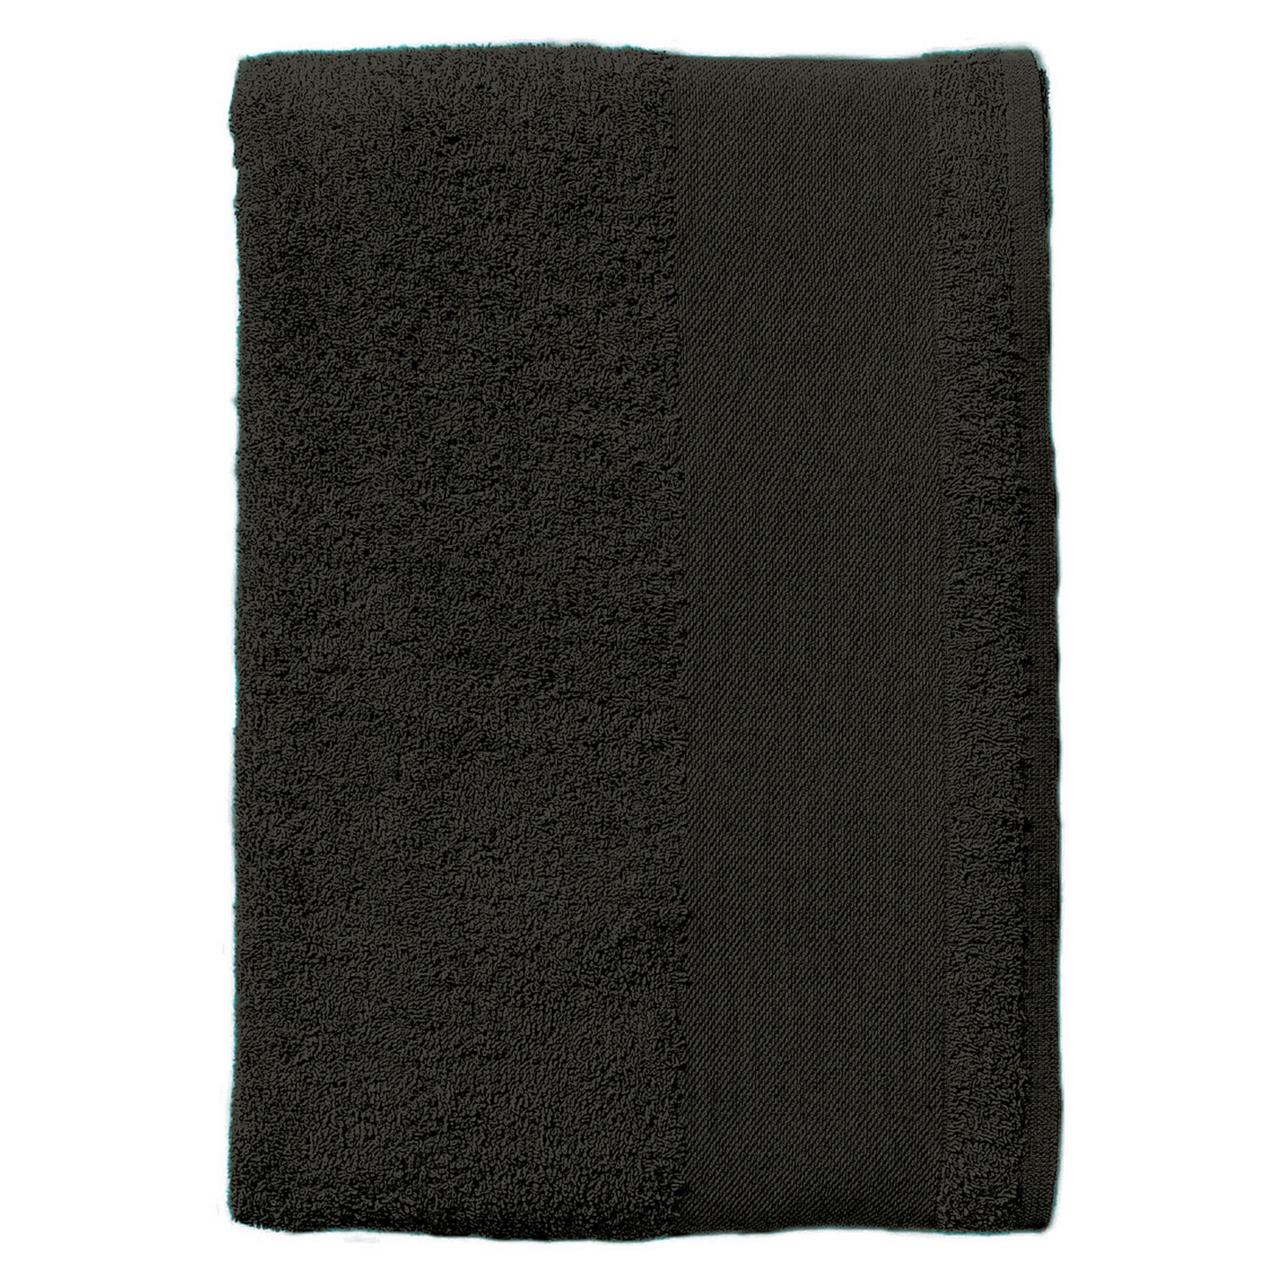 Полотенце махровое Island Medium, черное (артикул 4592.30)